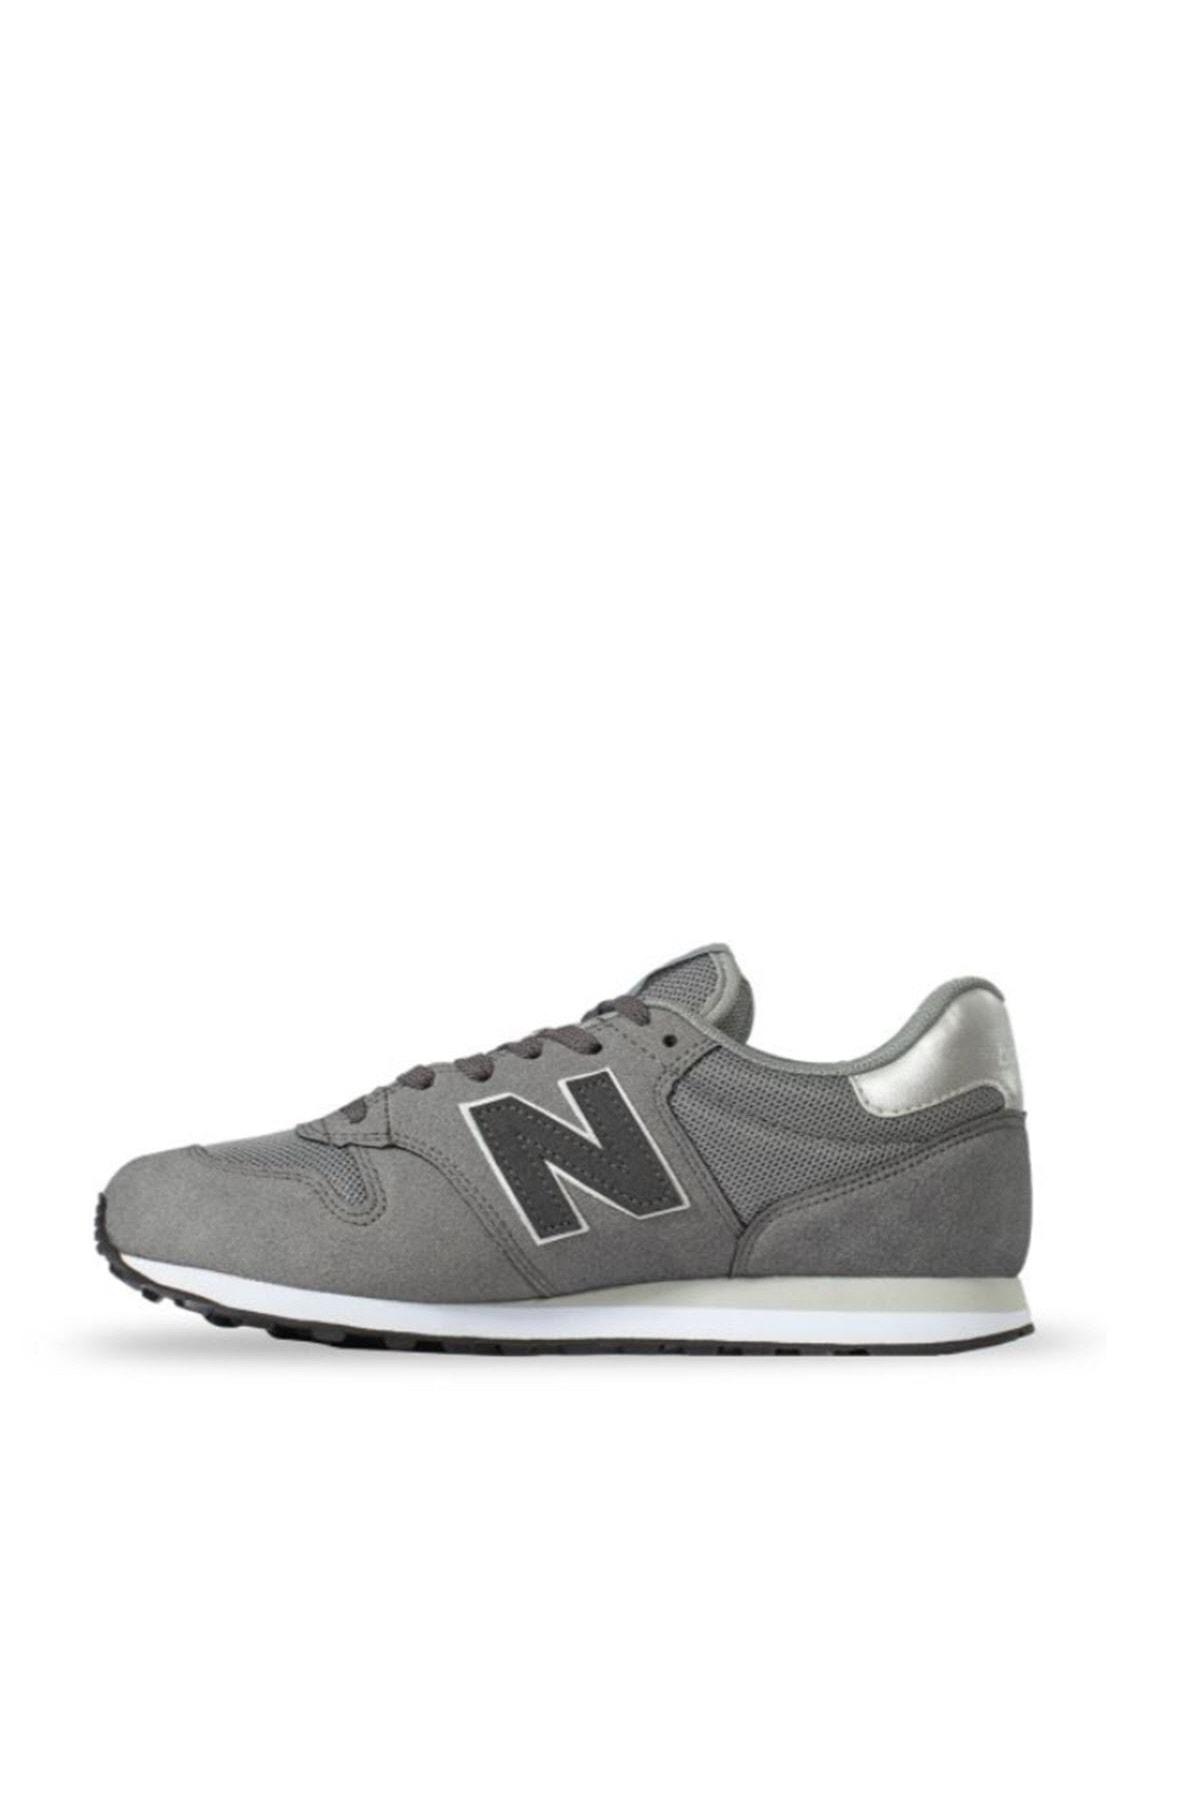 New Balance Kadın Sneaker - Lifestyle - GW500GGS 2